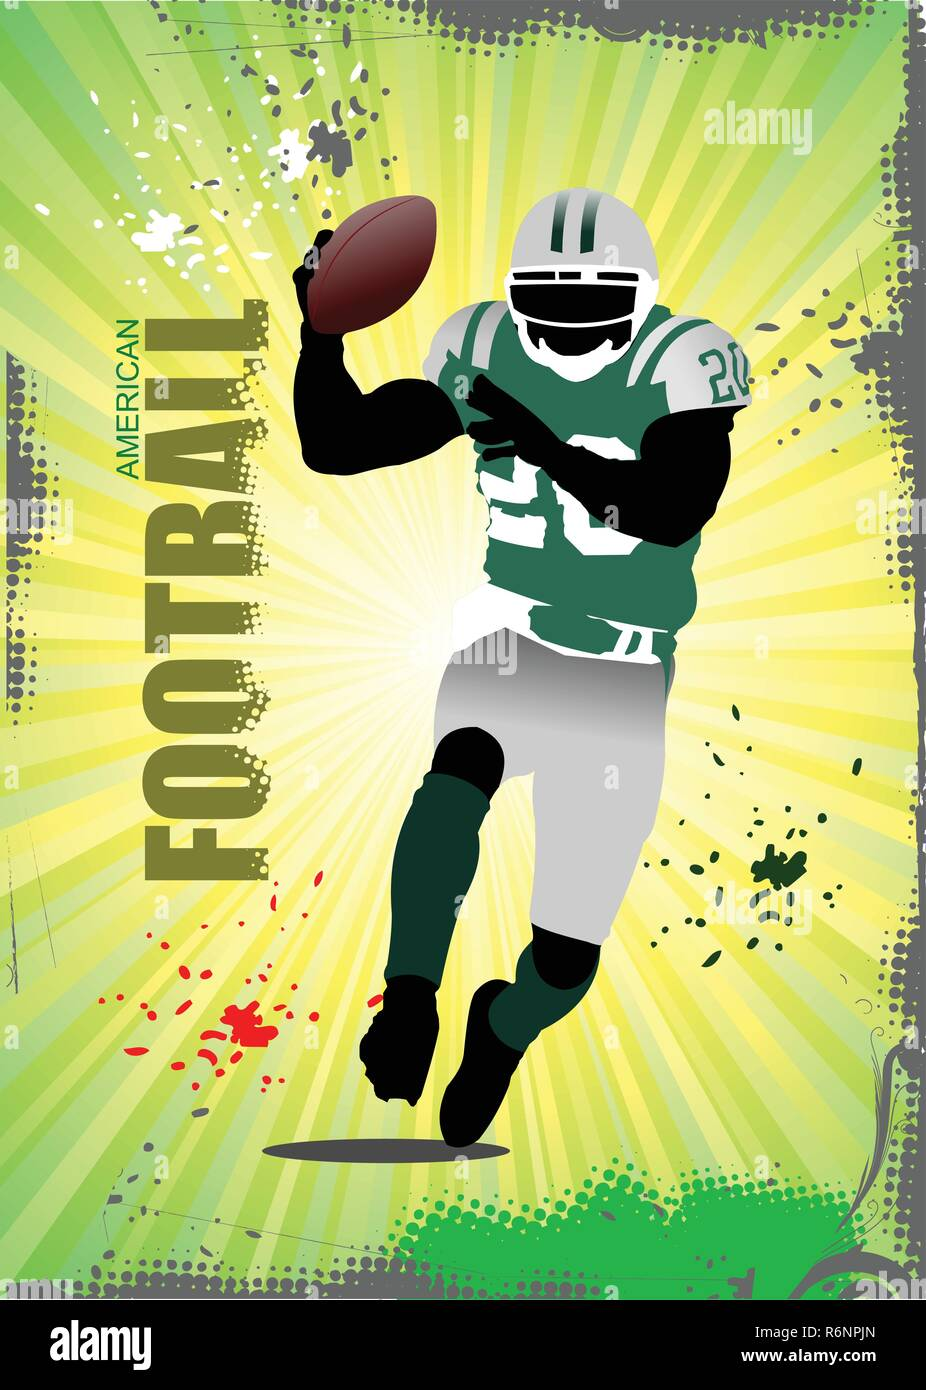 American football player poster. Vector illustration - Stock Vector